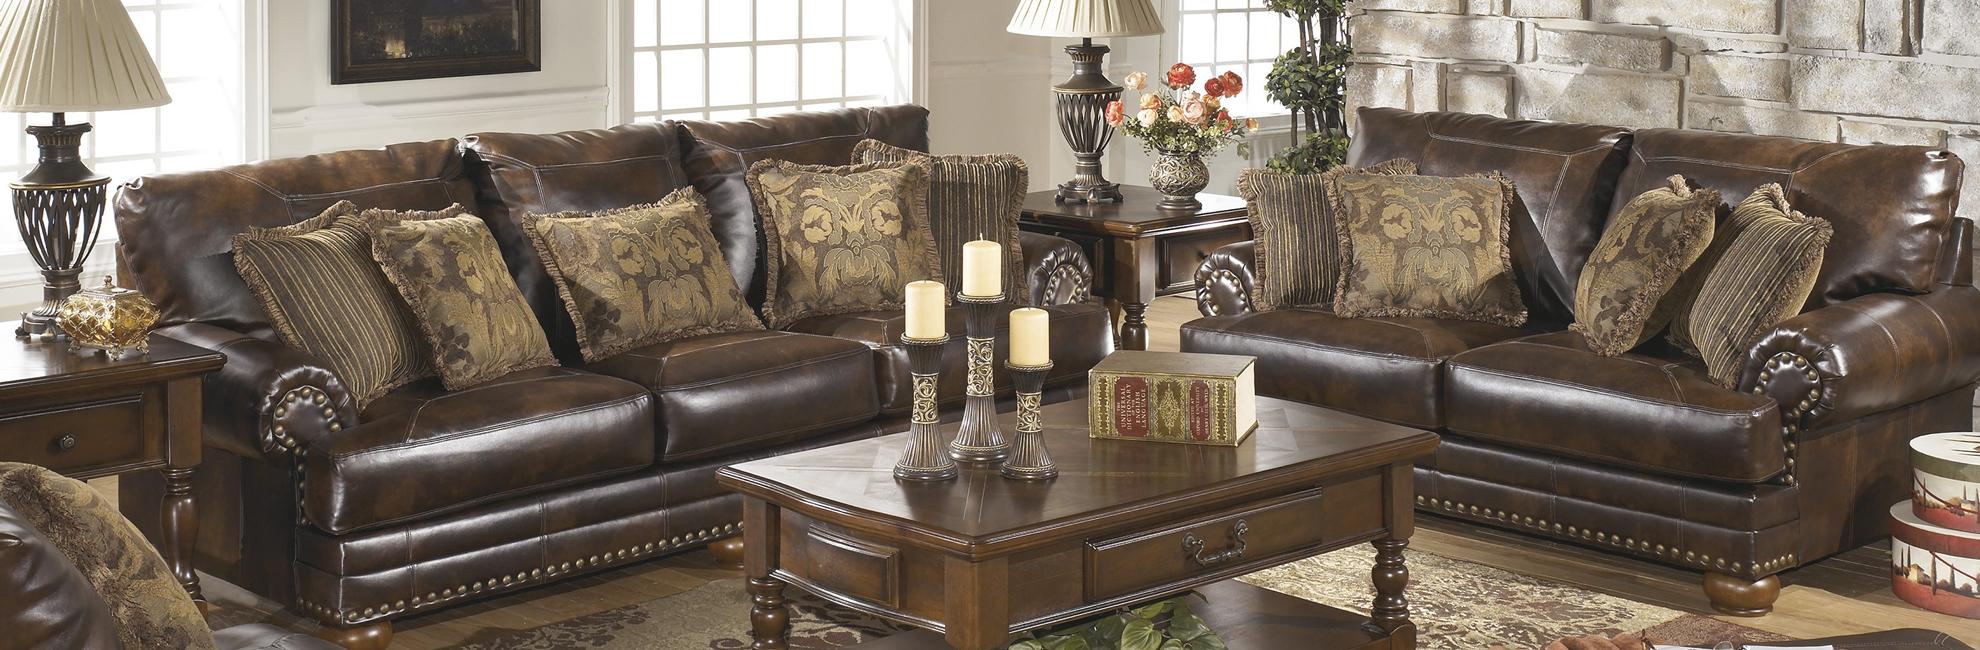 Manning Furniture Discount Warehouse Outlet Ashland KY